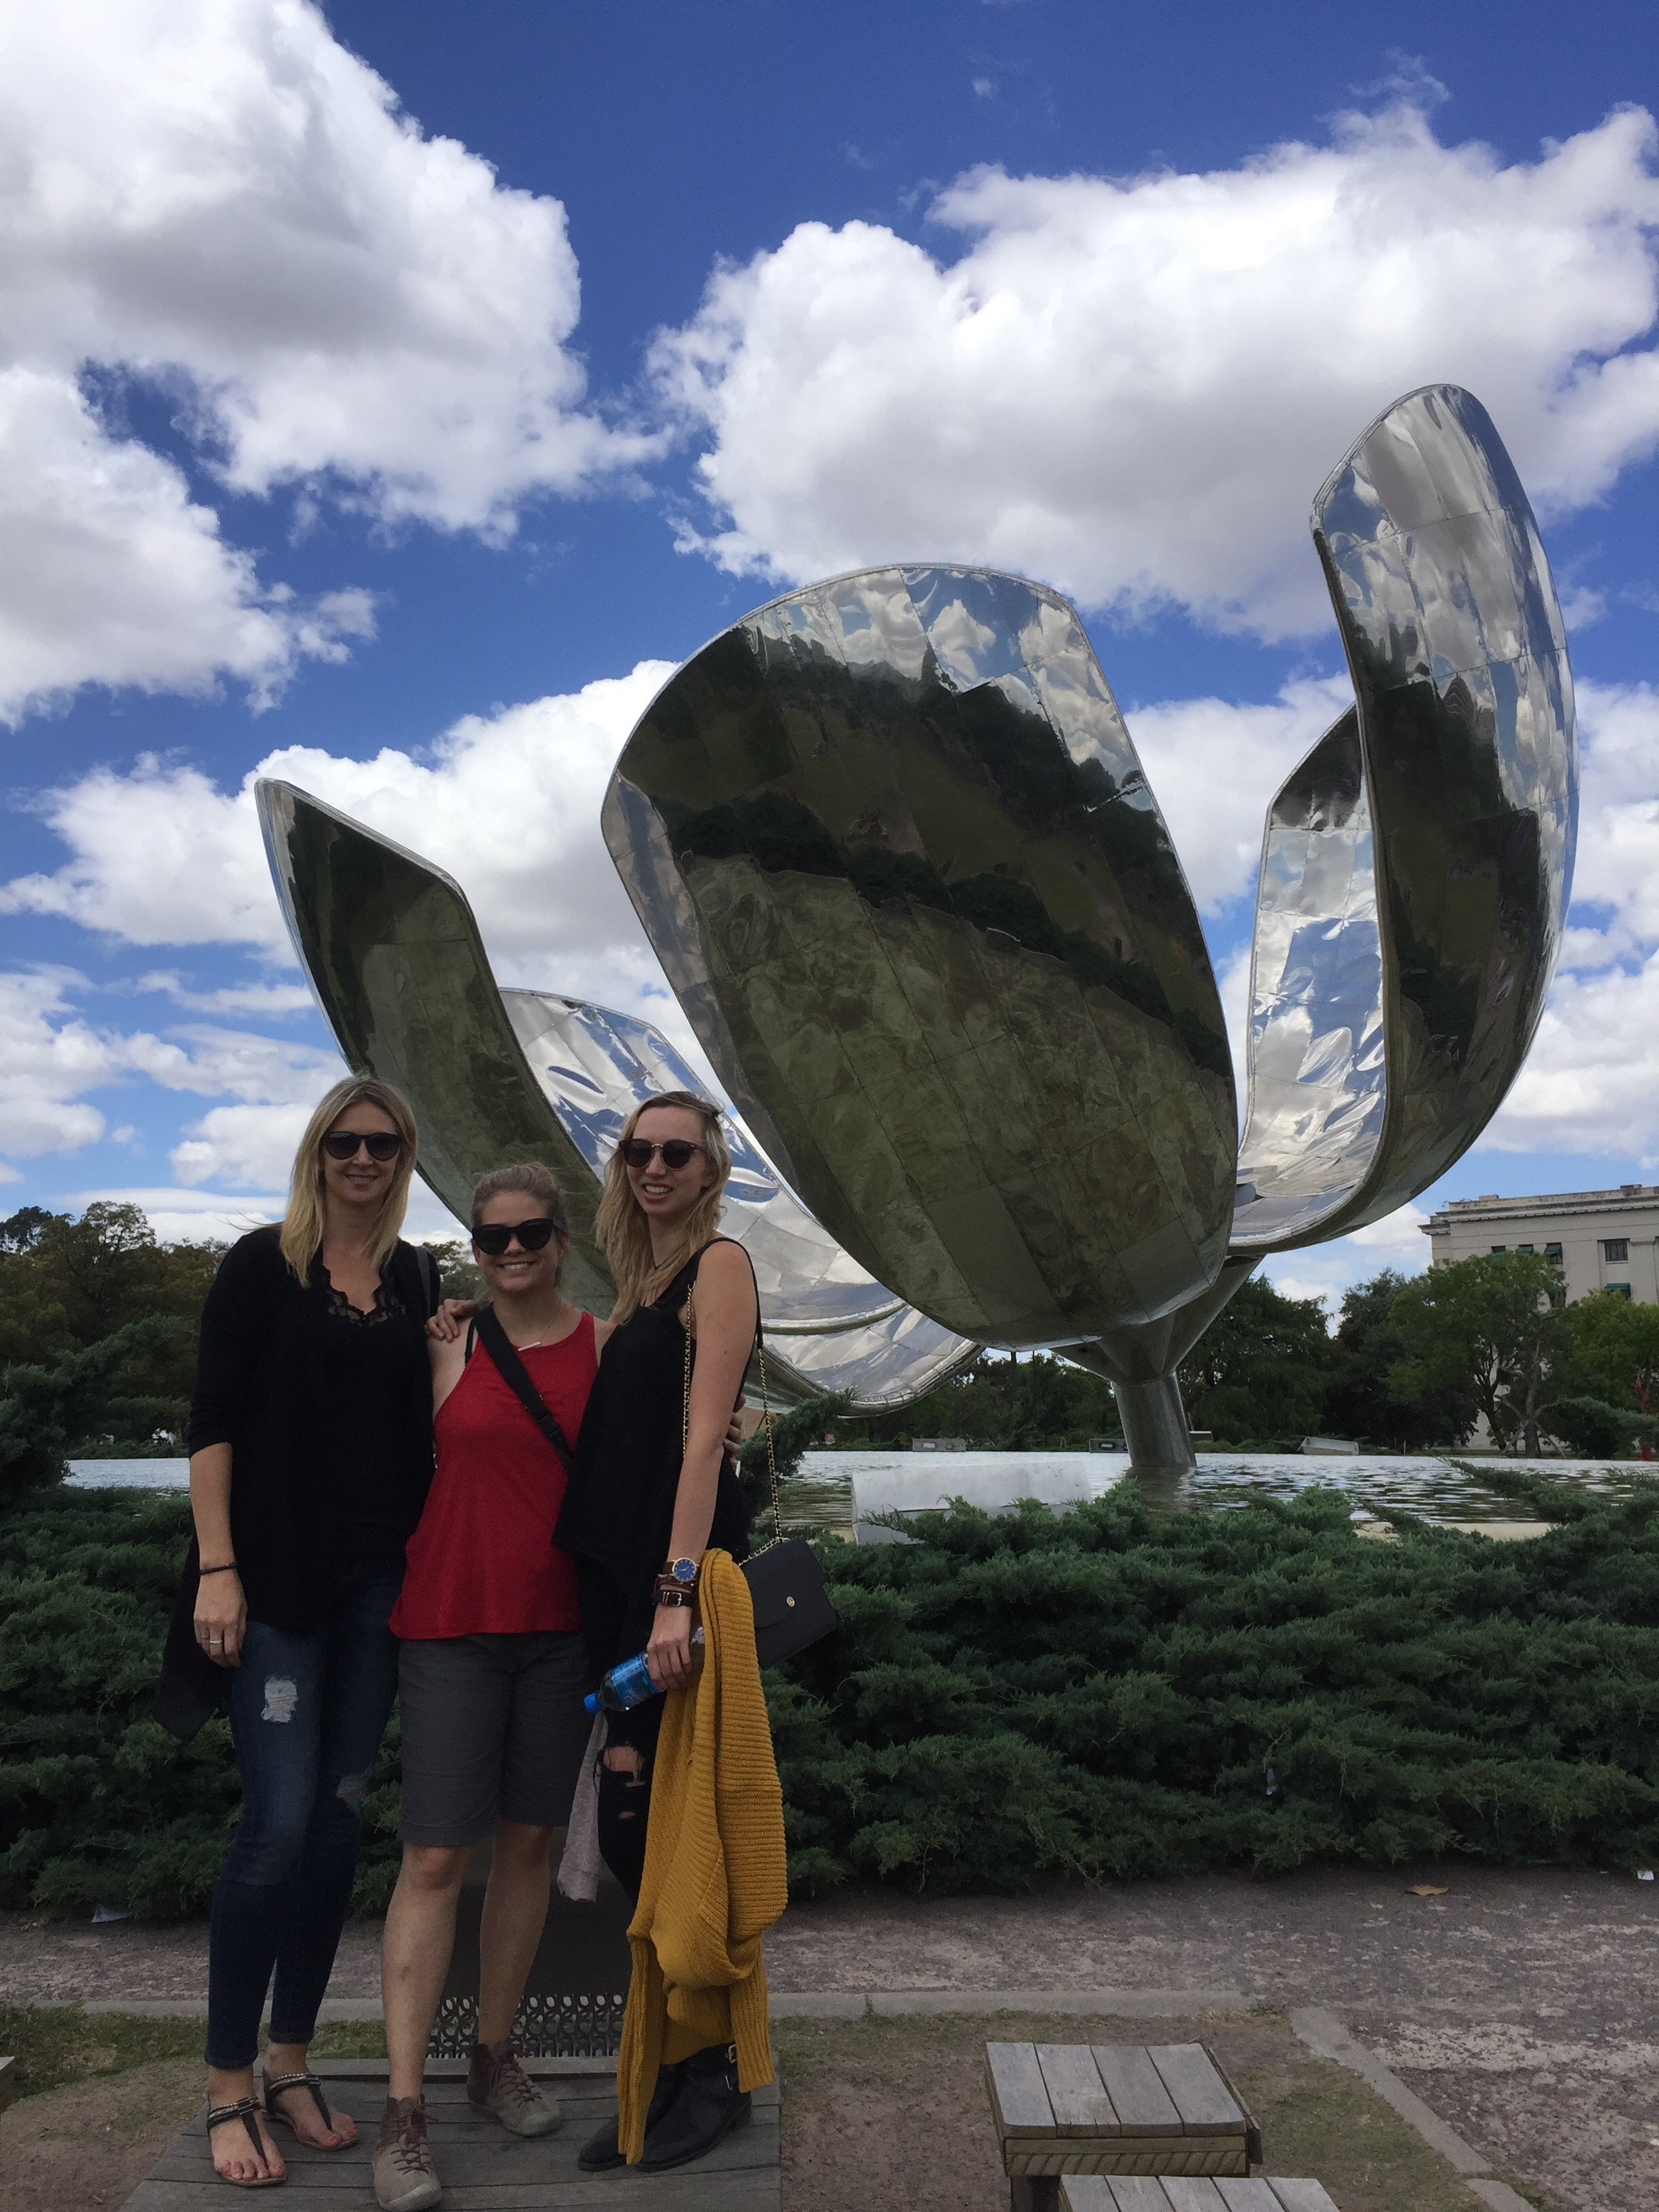 The metallic flower - a popular tourist attraction in BA